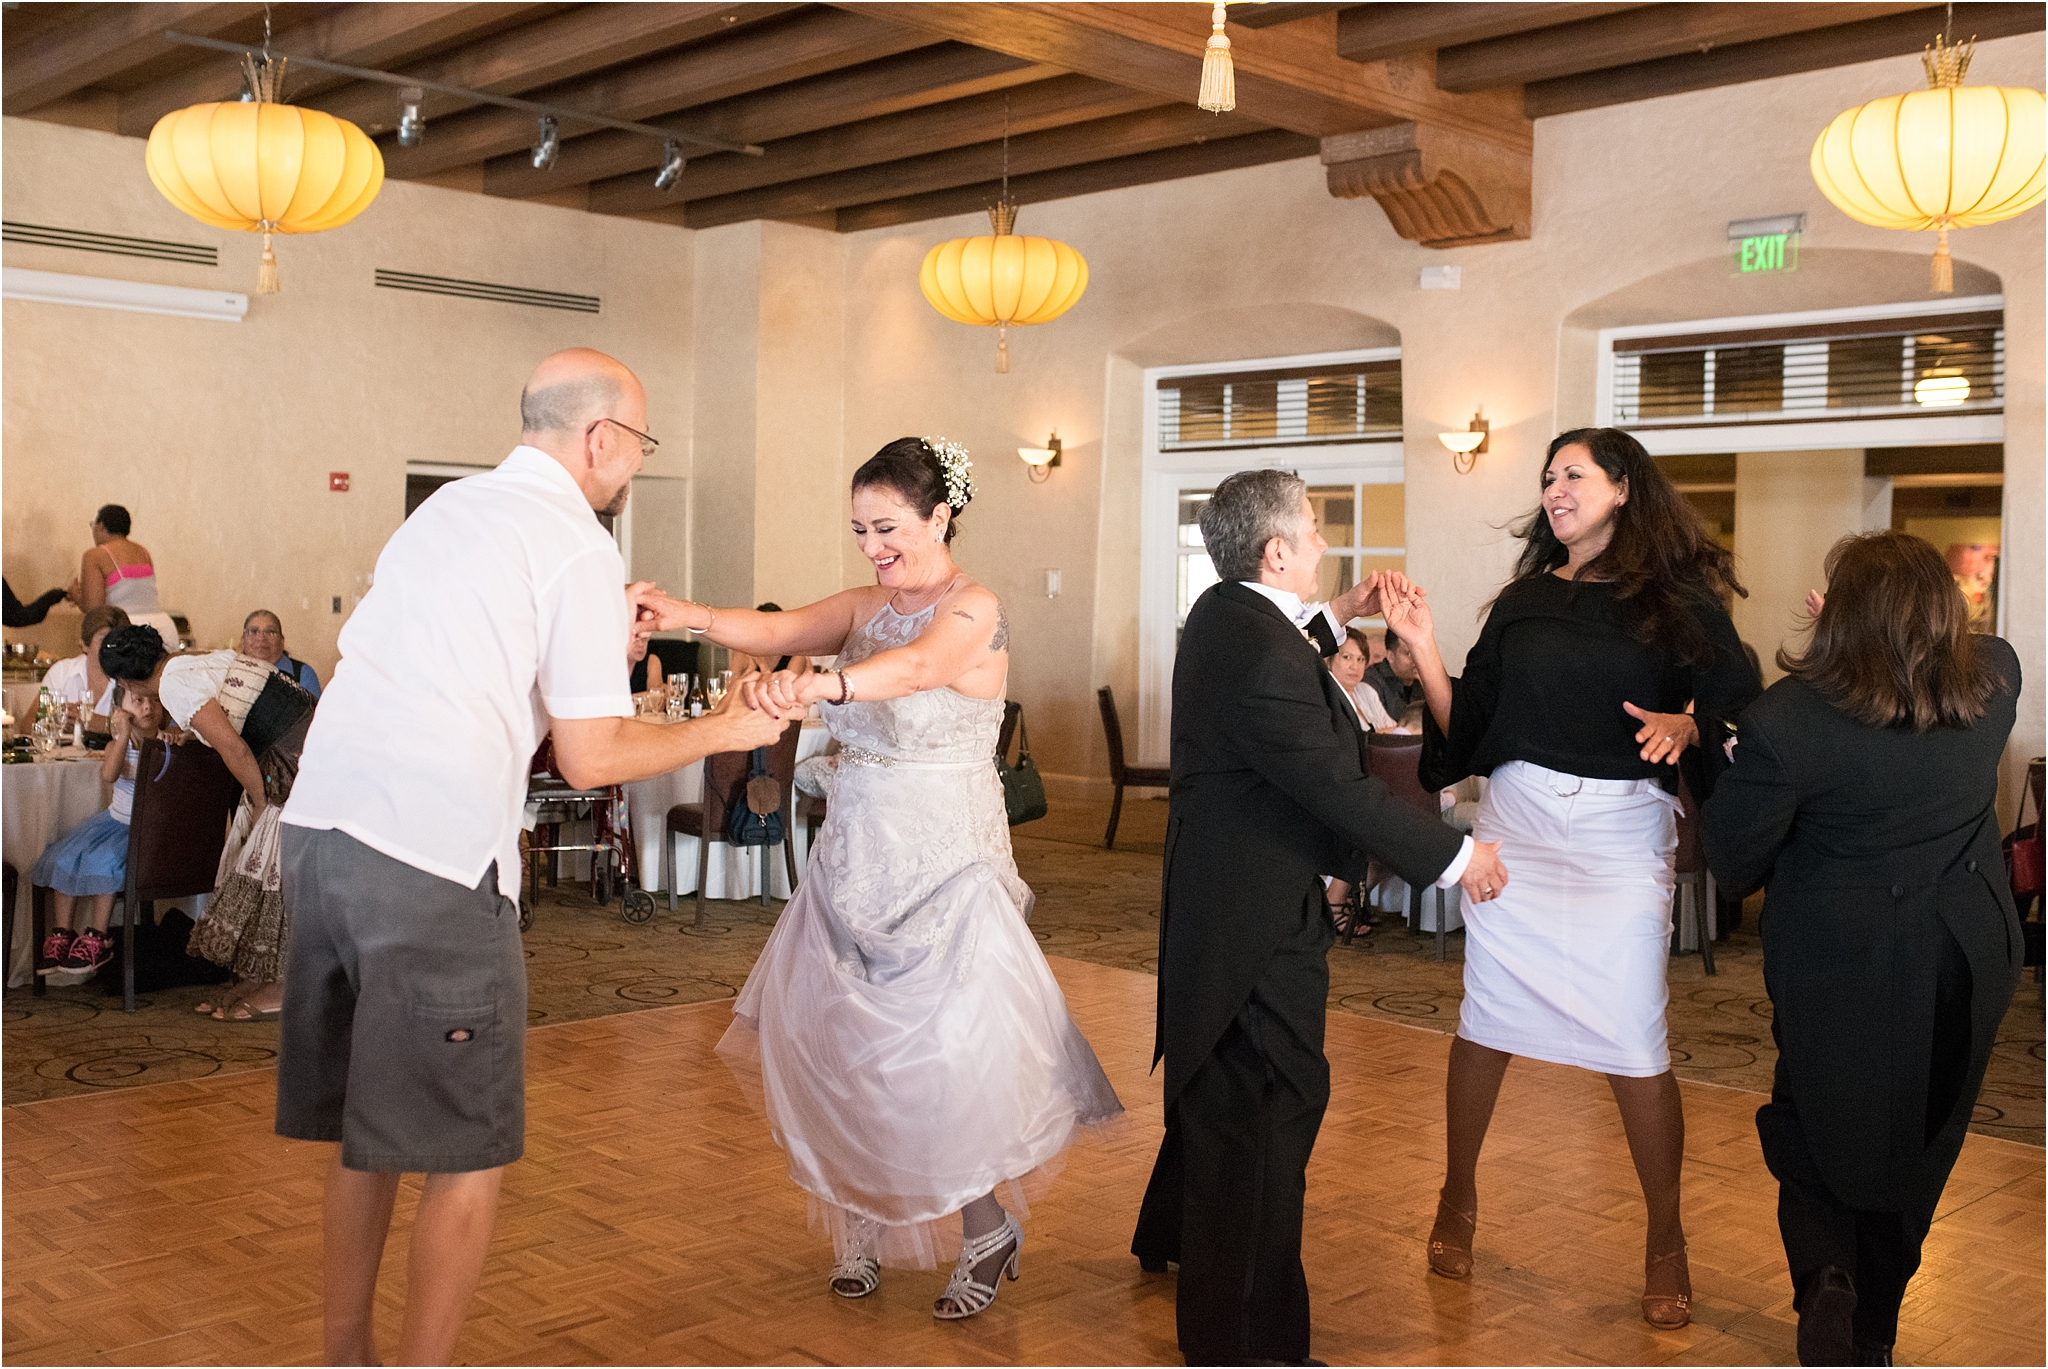 kayla kitts photography - albuquerque wedding photographer - hotel andaluz wedding_0030.jpg